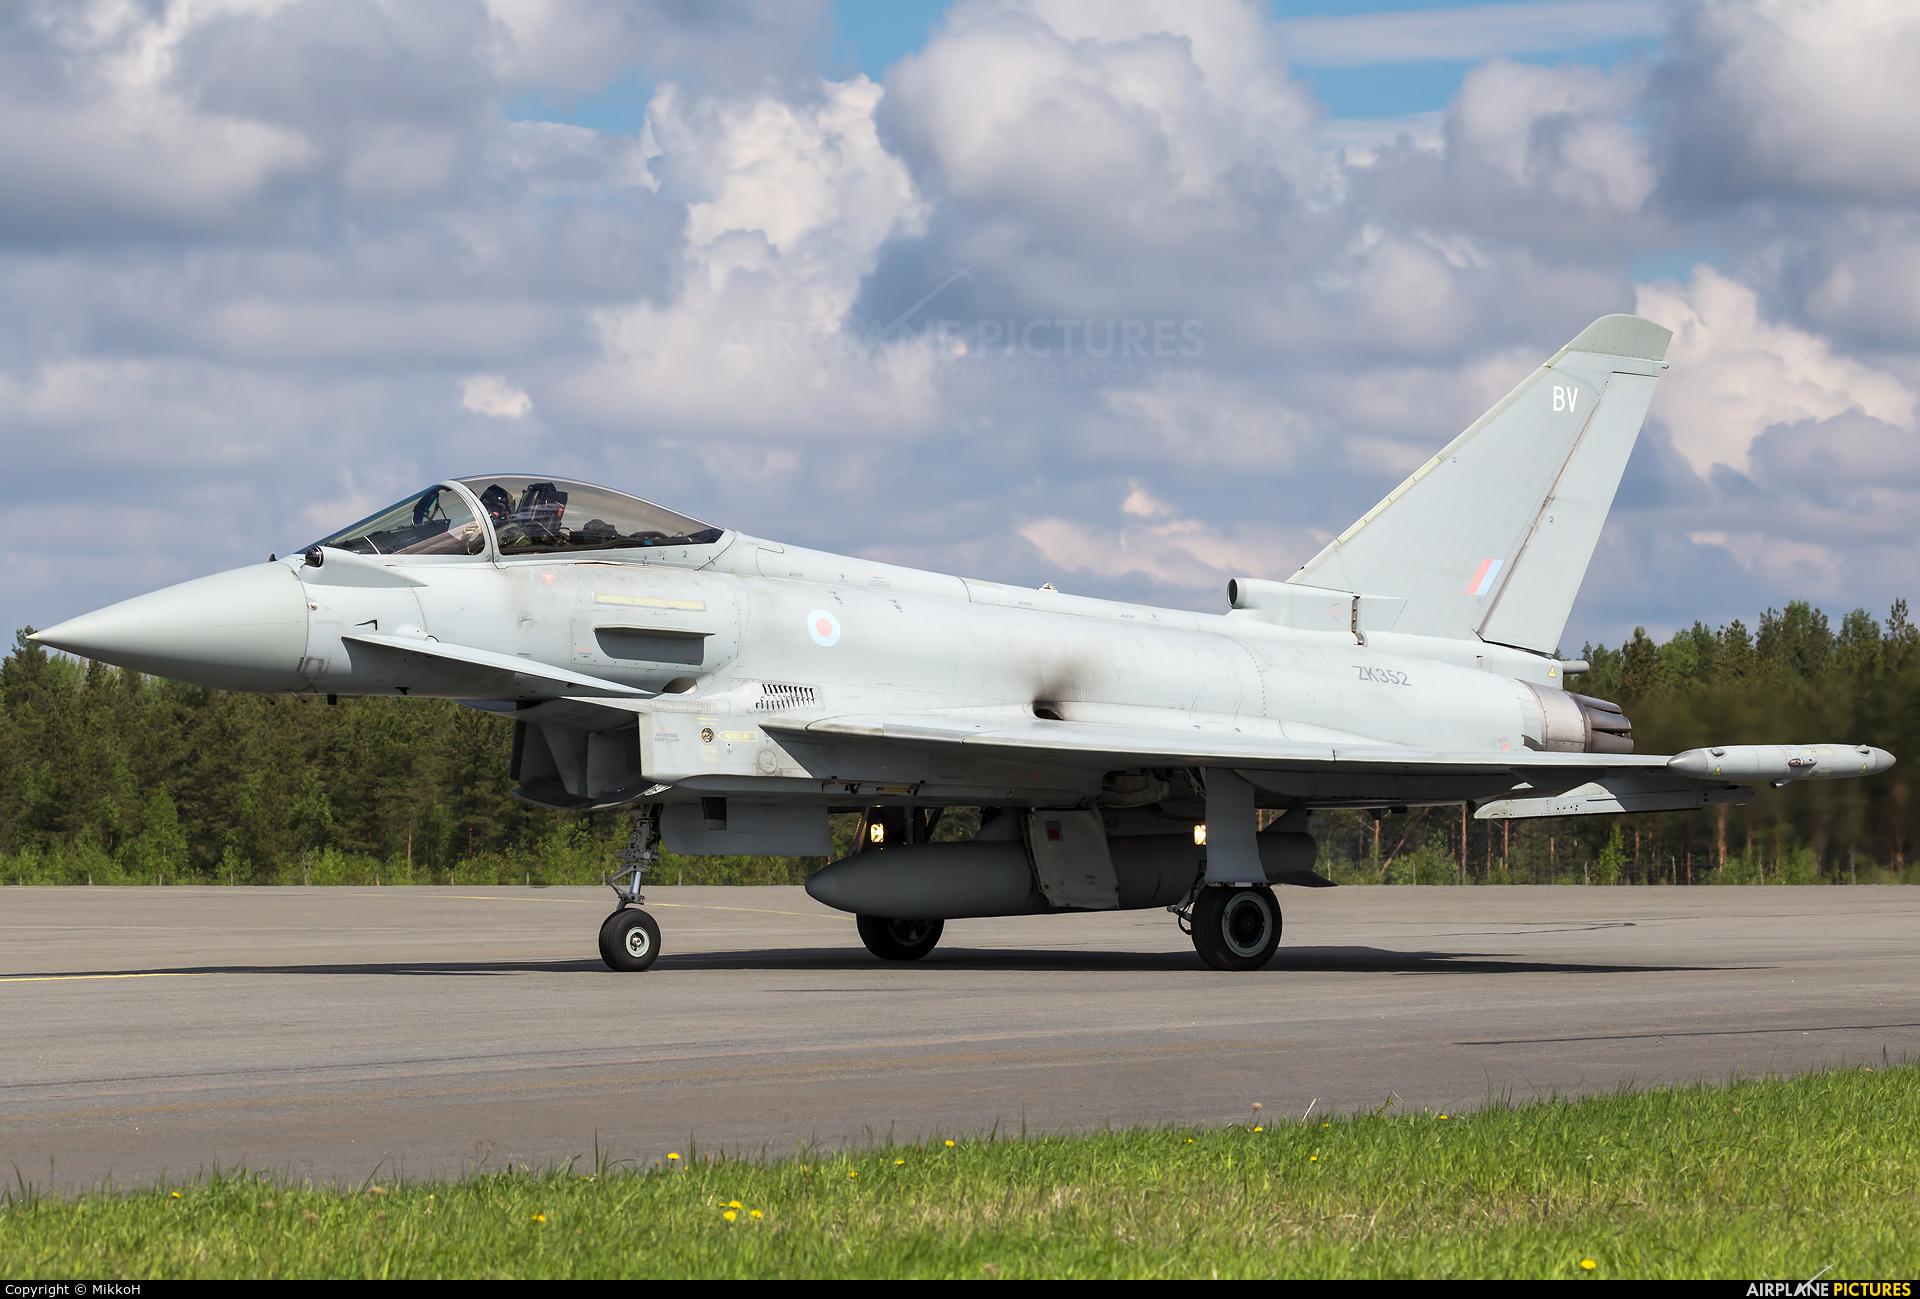 Royal Air Force ZK352 aircraft at Seinäjoki Airport